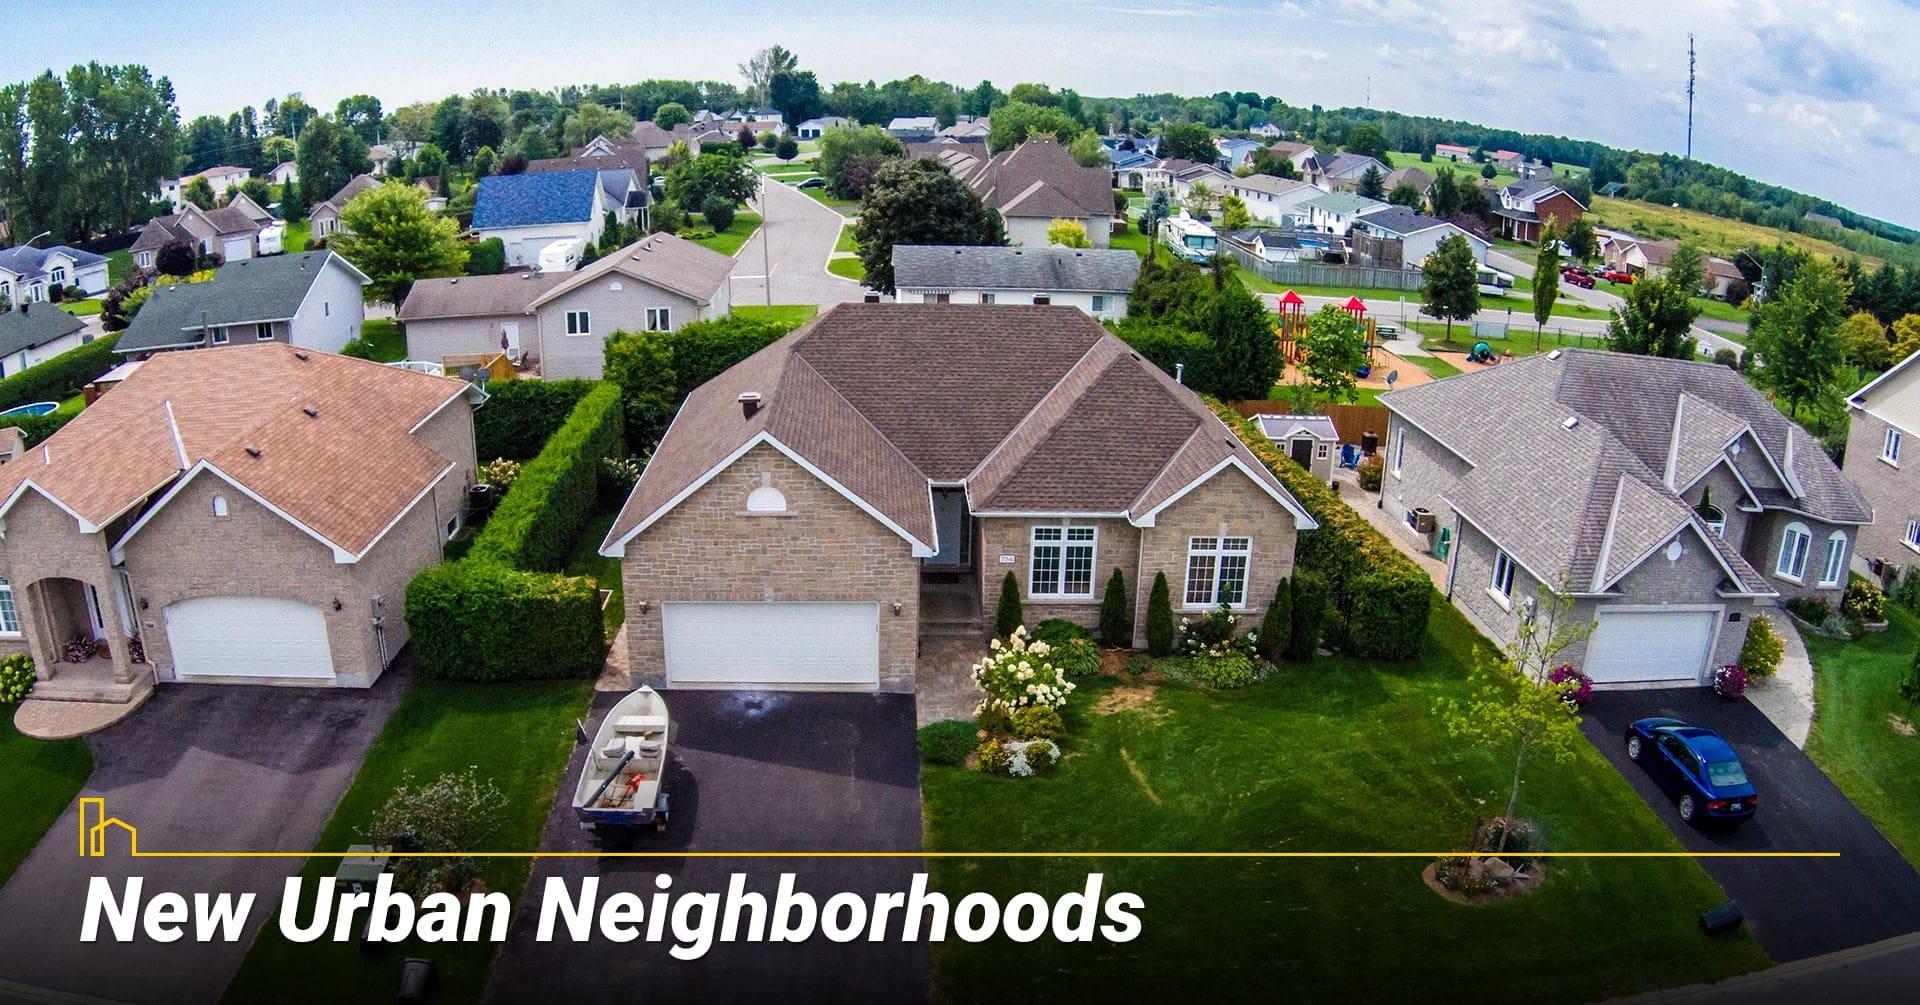 New Urban Neighborhoods, newly developed urban neighborhoods